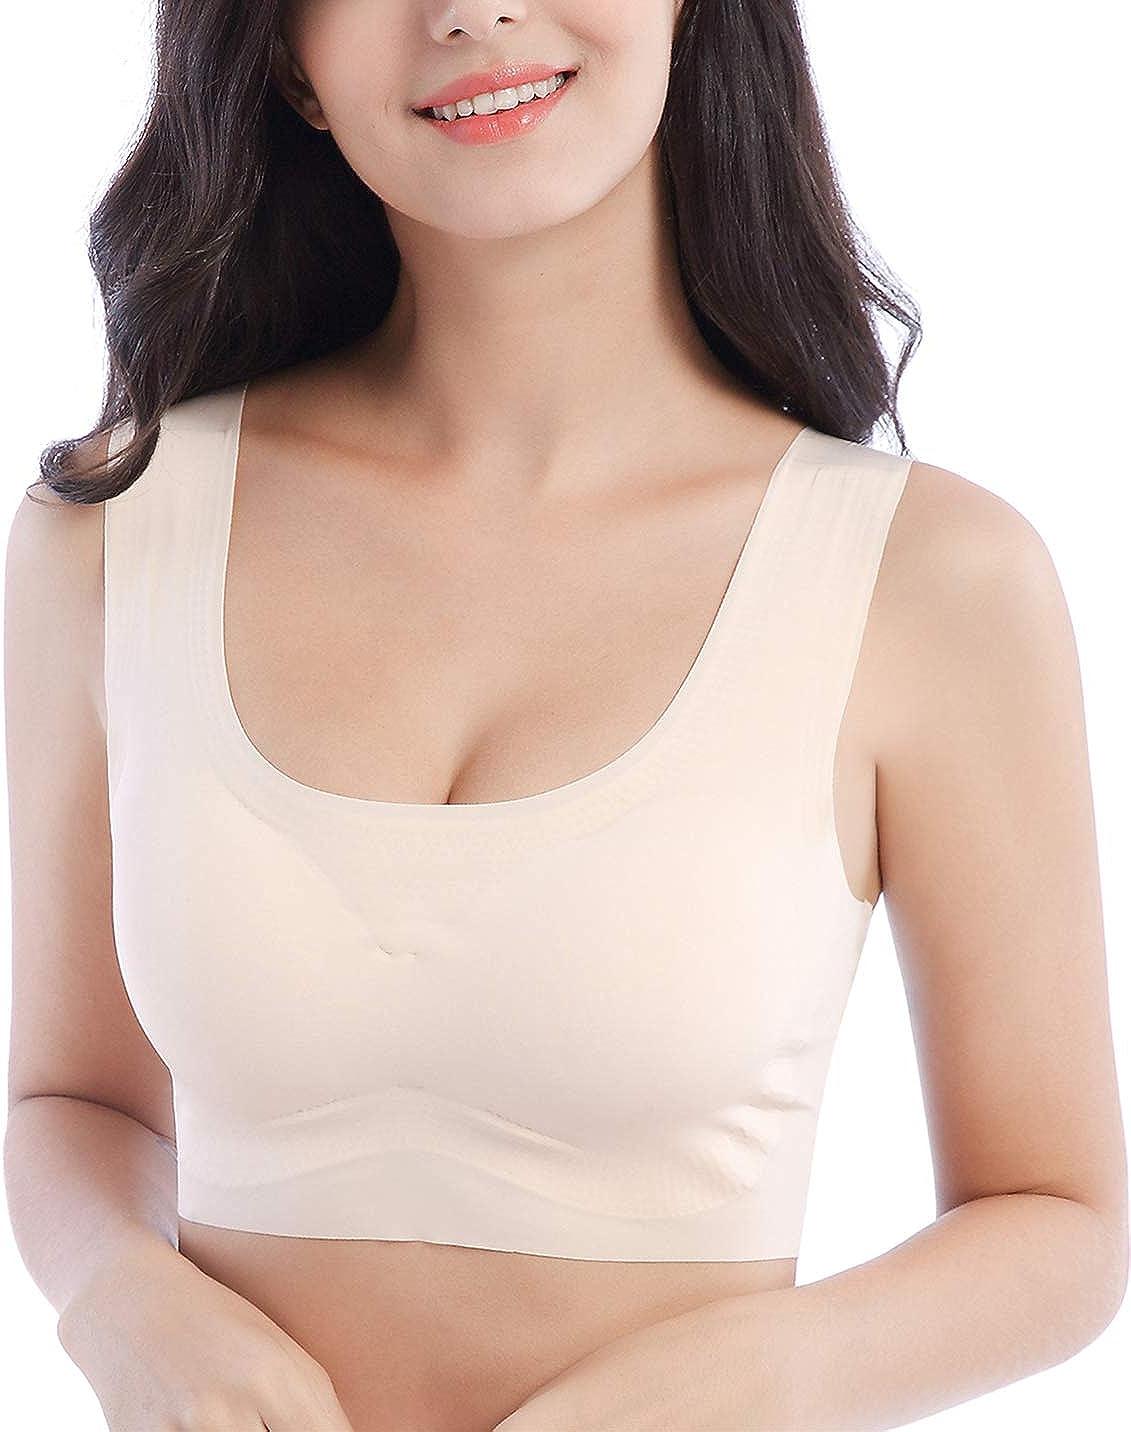 Xuvozta Women Seamless Bralette Wirefree Yoga Bra Soft Sleeping Bra Removable Pad